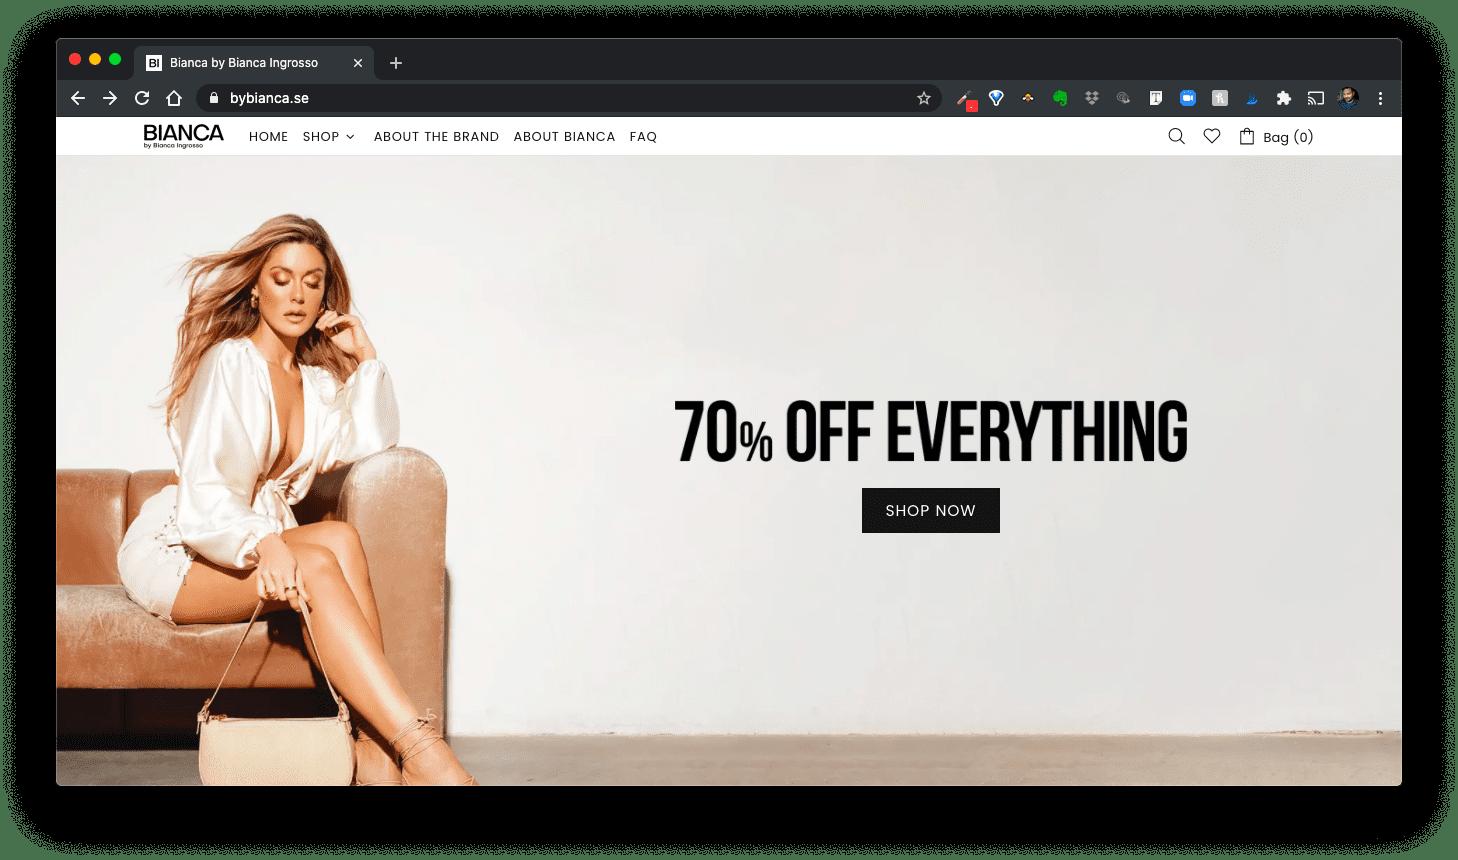 Influencer marketing - Bianca Ingrosso website